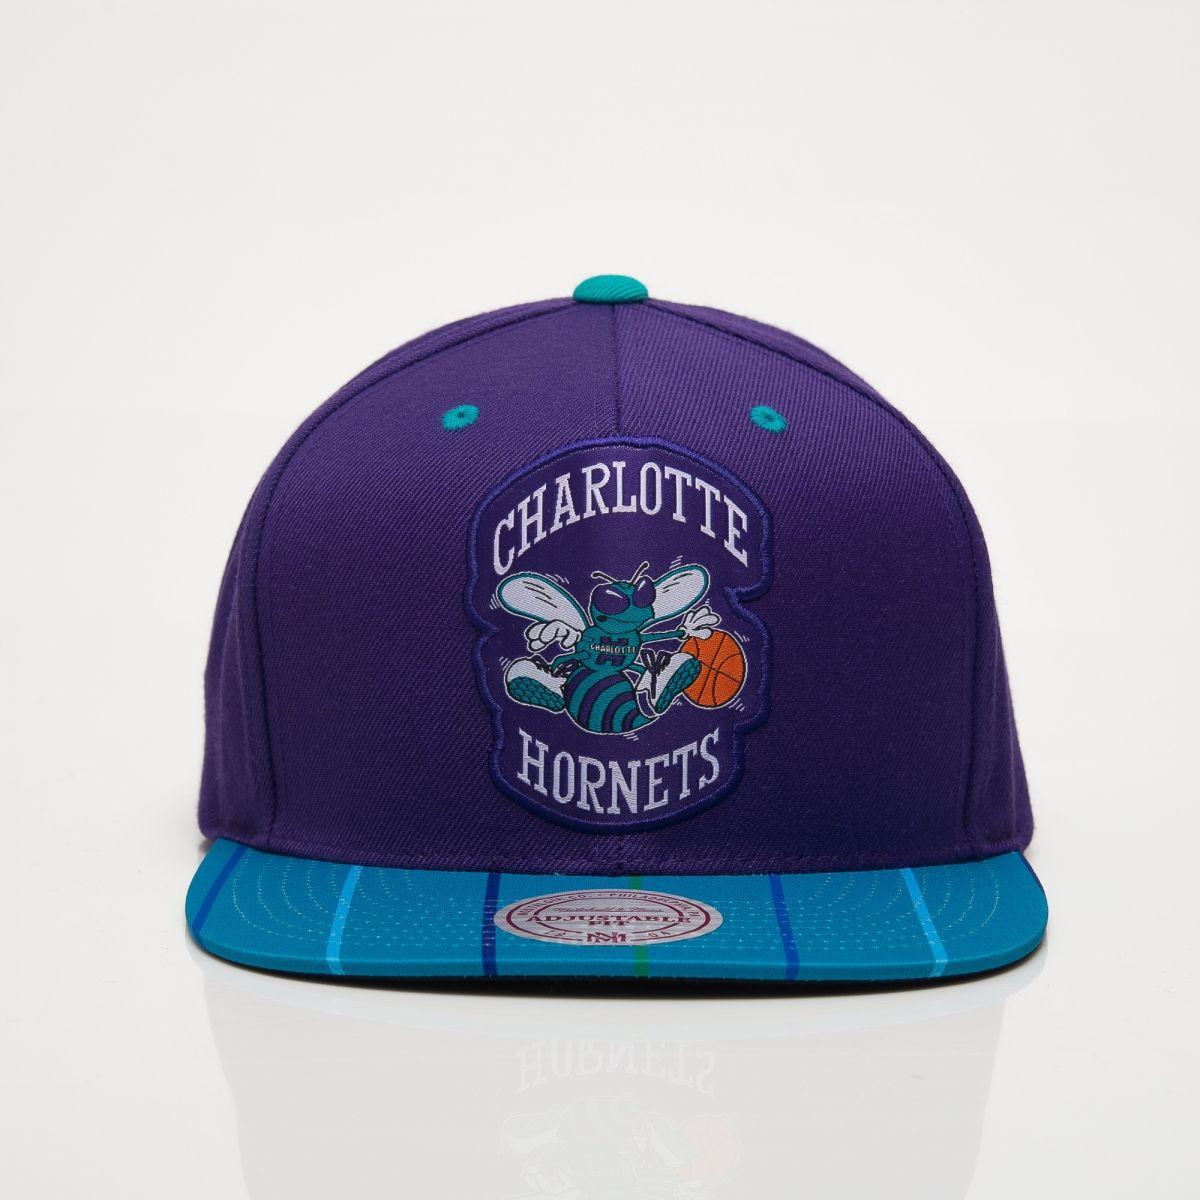 d05144ad66b 1200x1200 · Type Caps Mitchell  amp  Ness NBA Charlotte Hornets Diamond  Snapback Cap